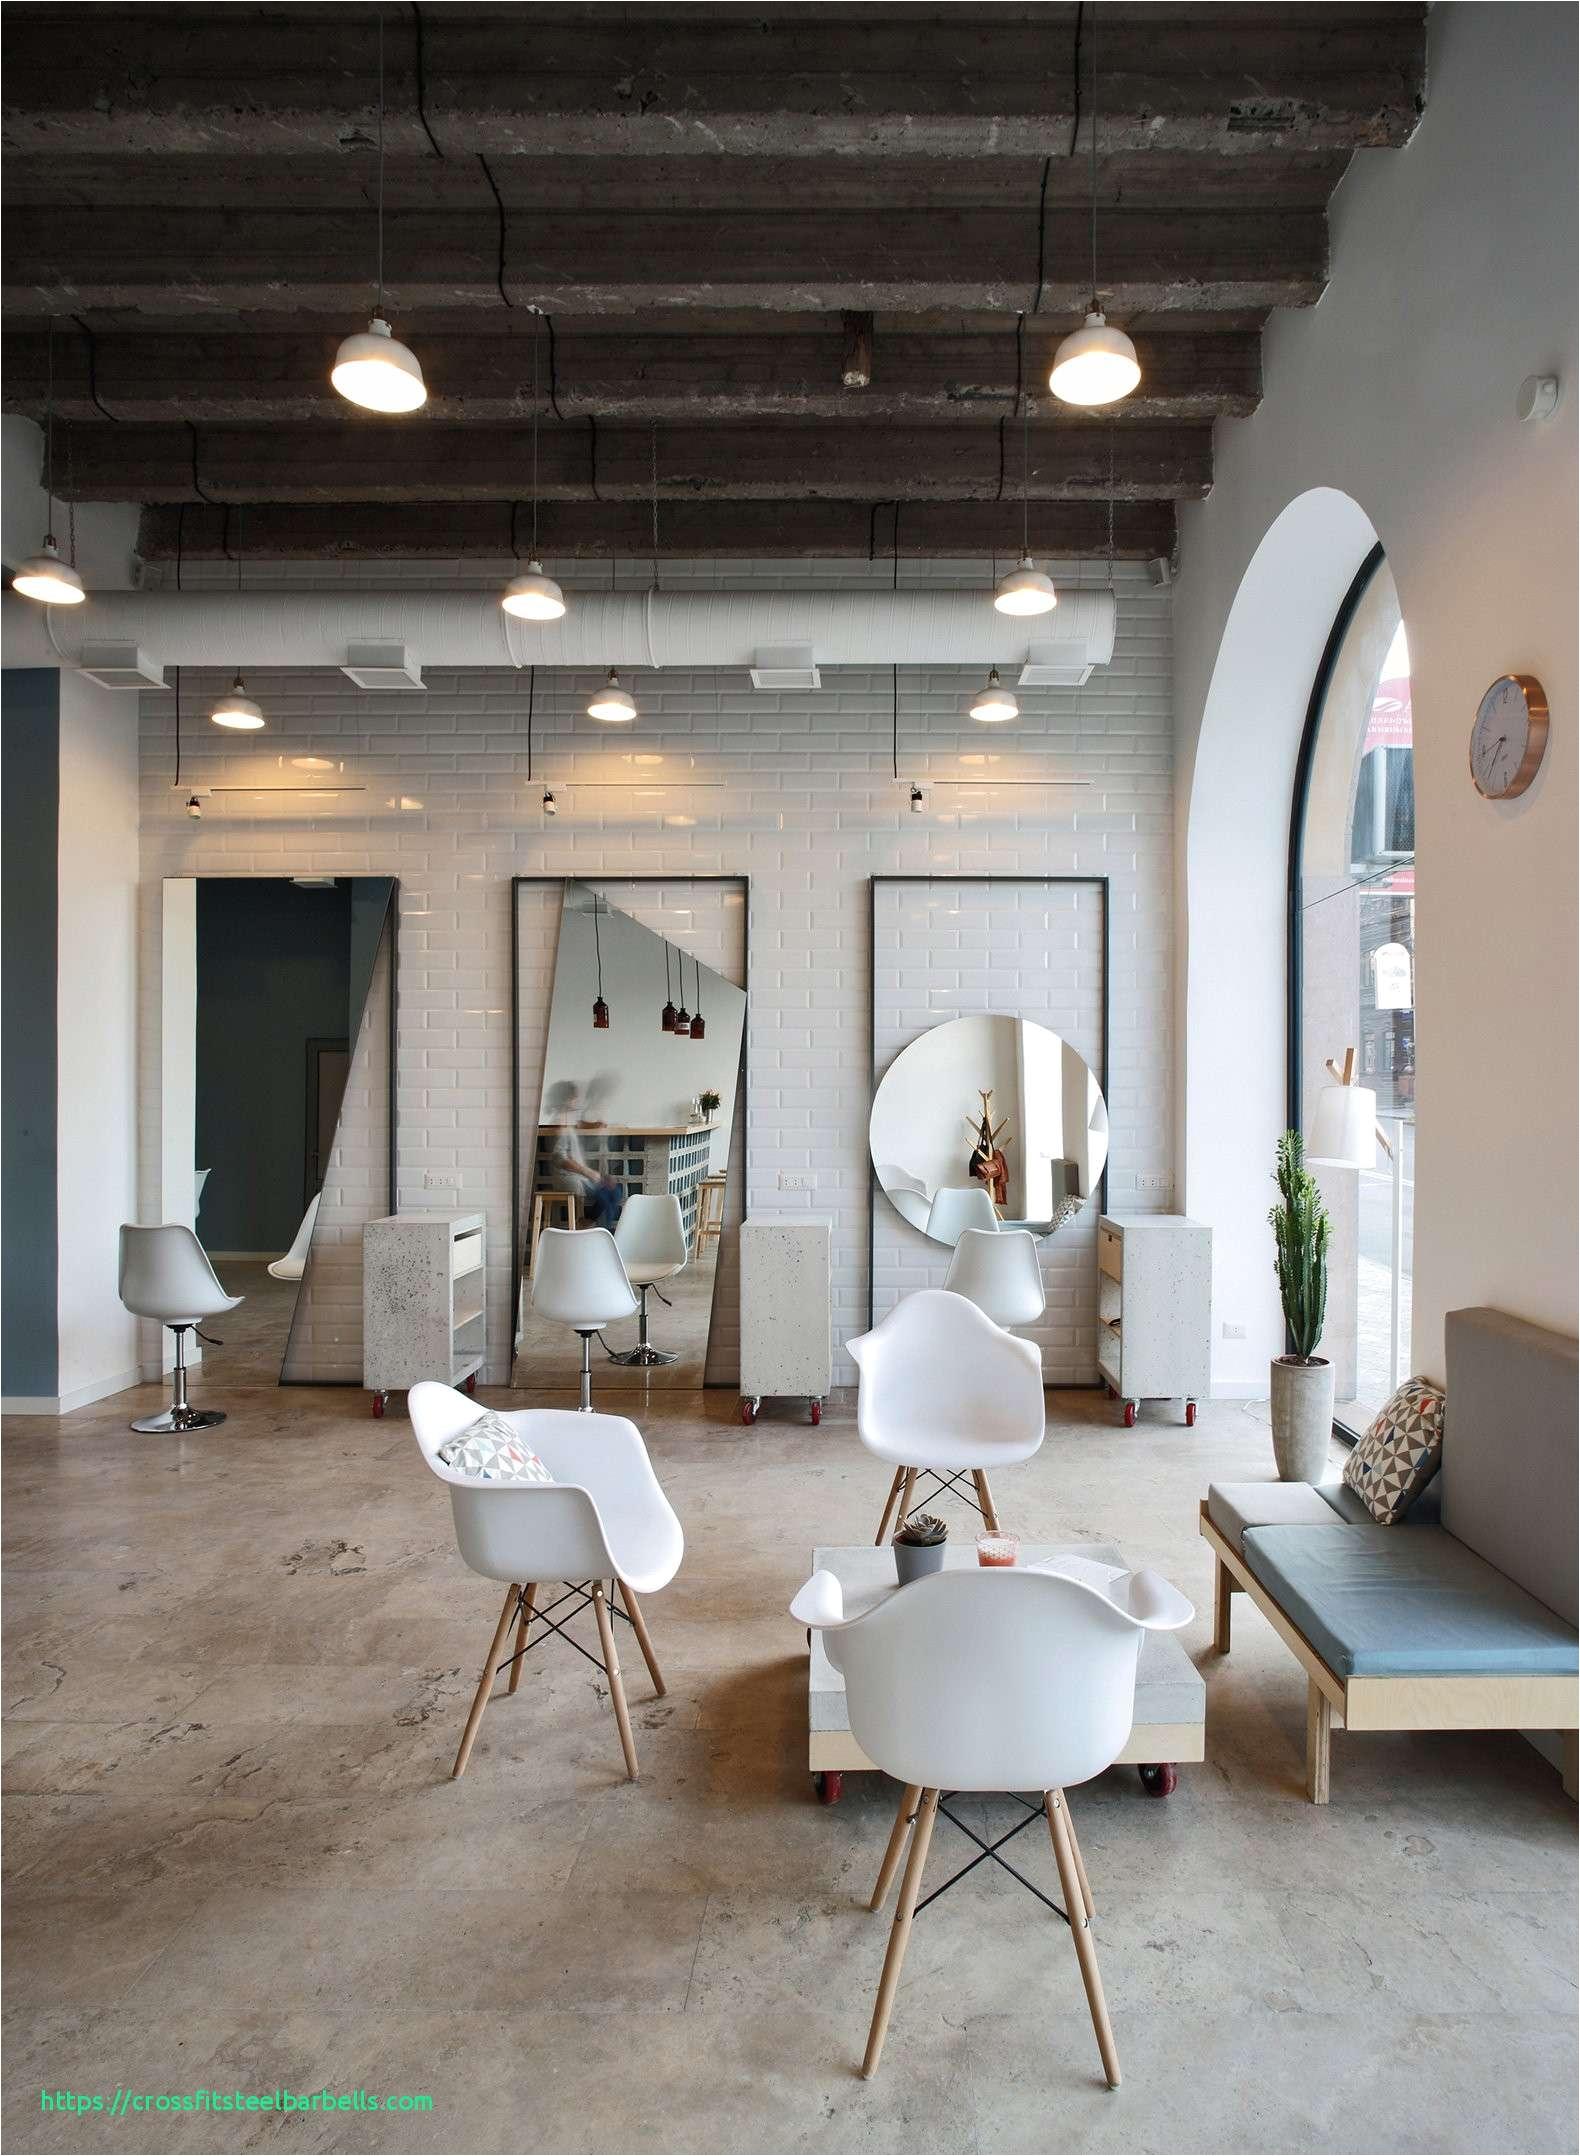 best of interior designing jobs in mumbai for freshers